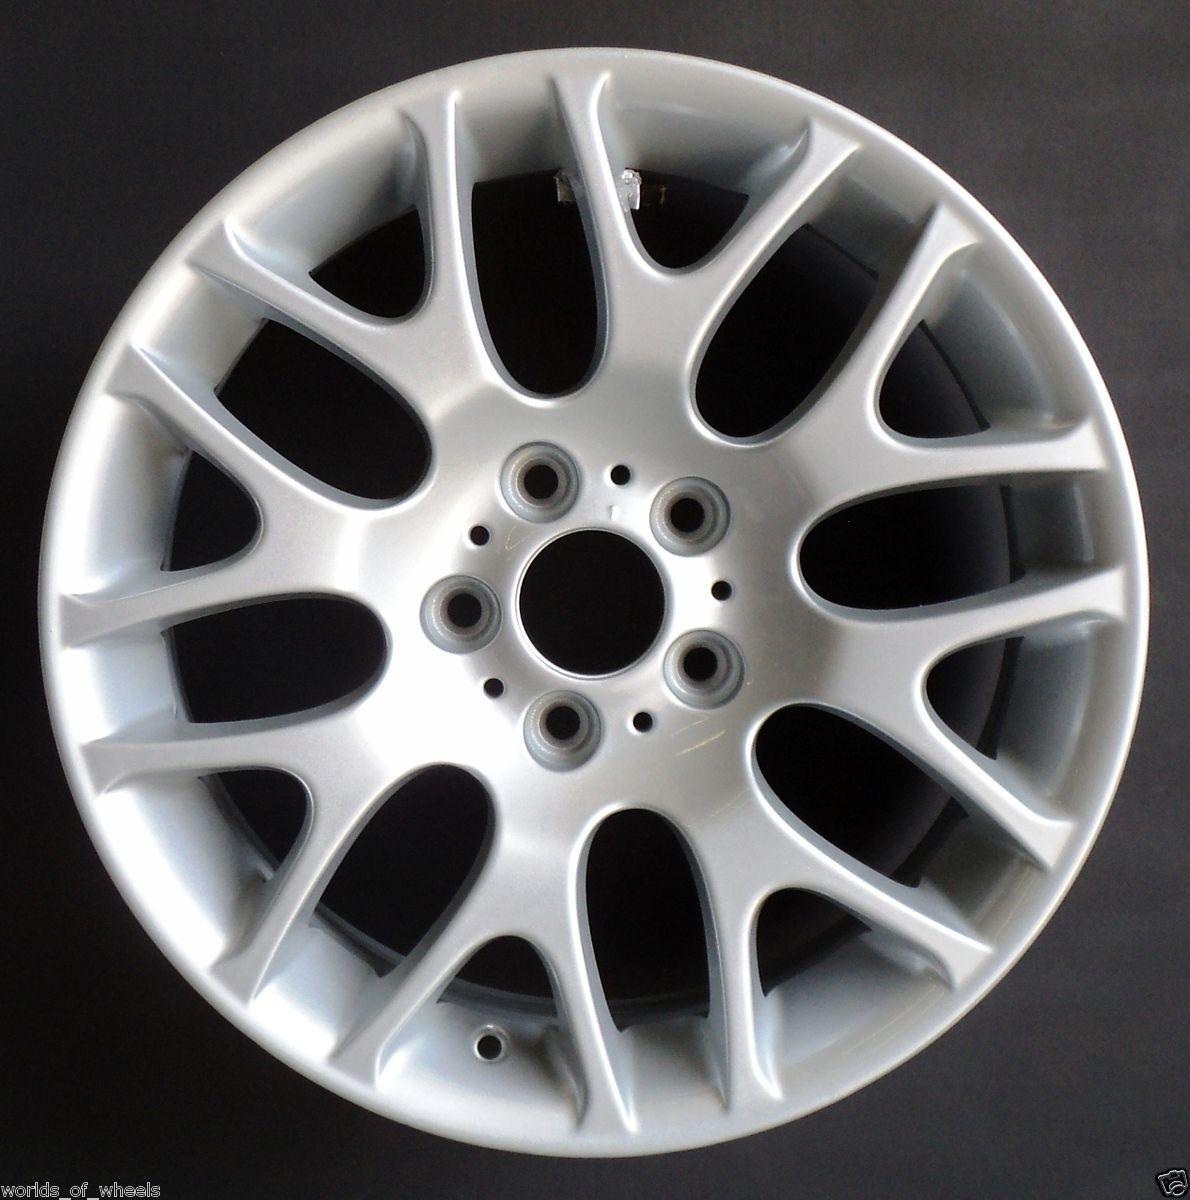 07 08 10 BMW 3 Series Snowflake 18 Front Factory OEM Wheel Rim H 59615